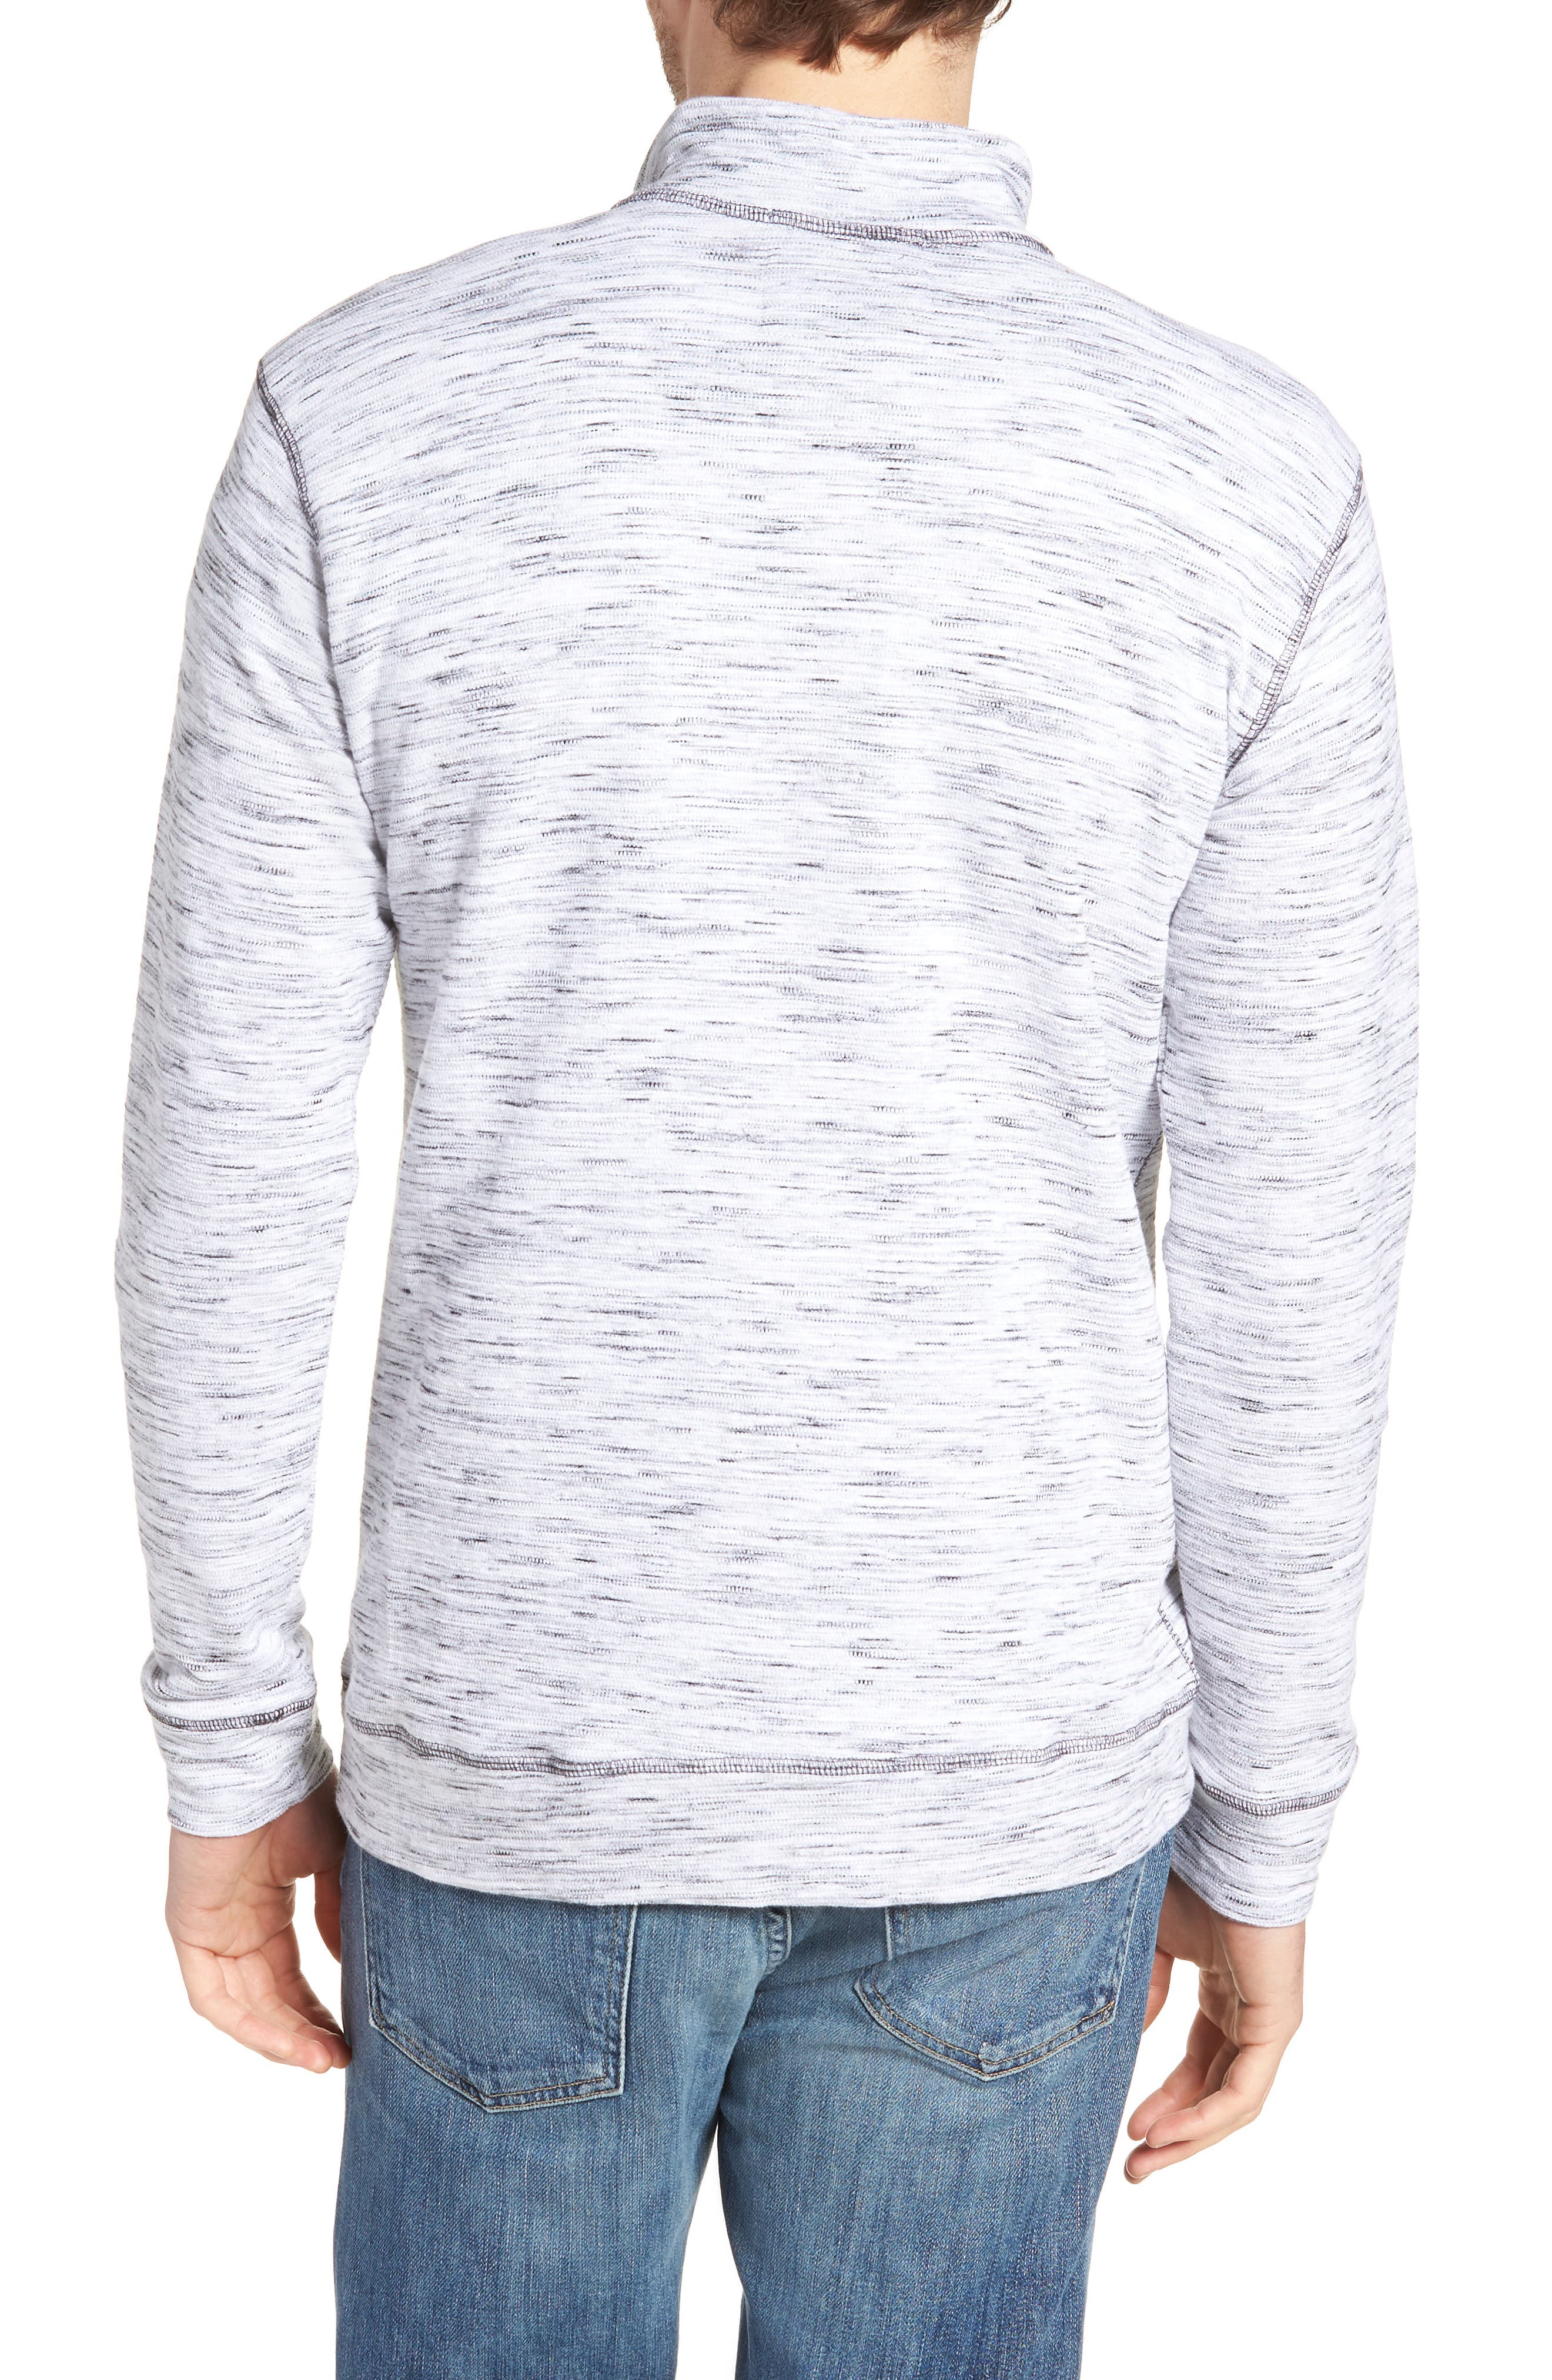 Regular Fit Jacquard Quarter Zip Shirt,                             Alternate thumbnail 2, color,                             270